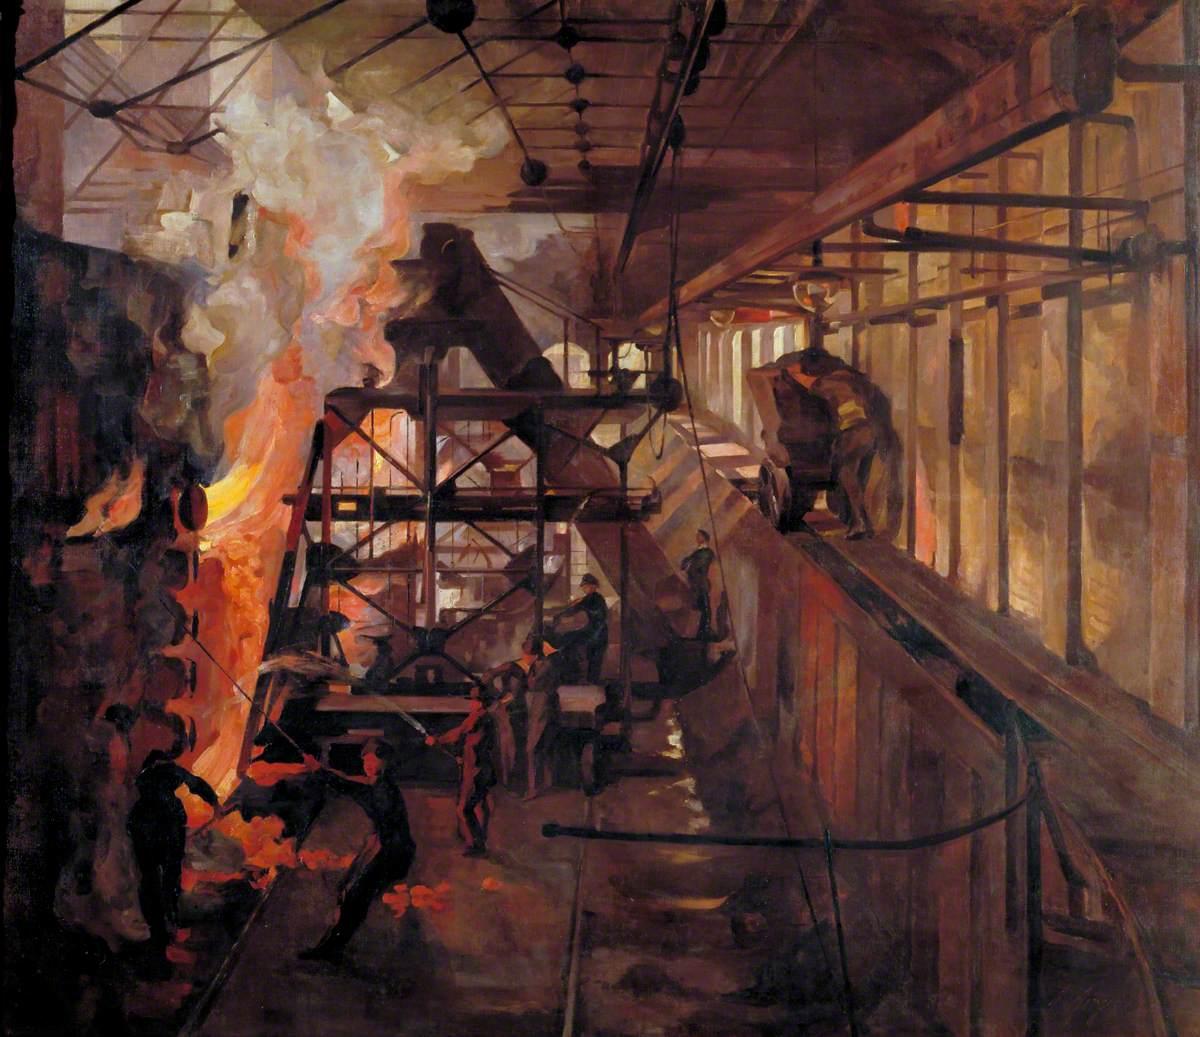 Women Working in a Gas Retort House: South Metropolitan Gas Company, London